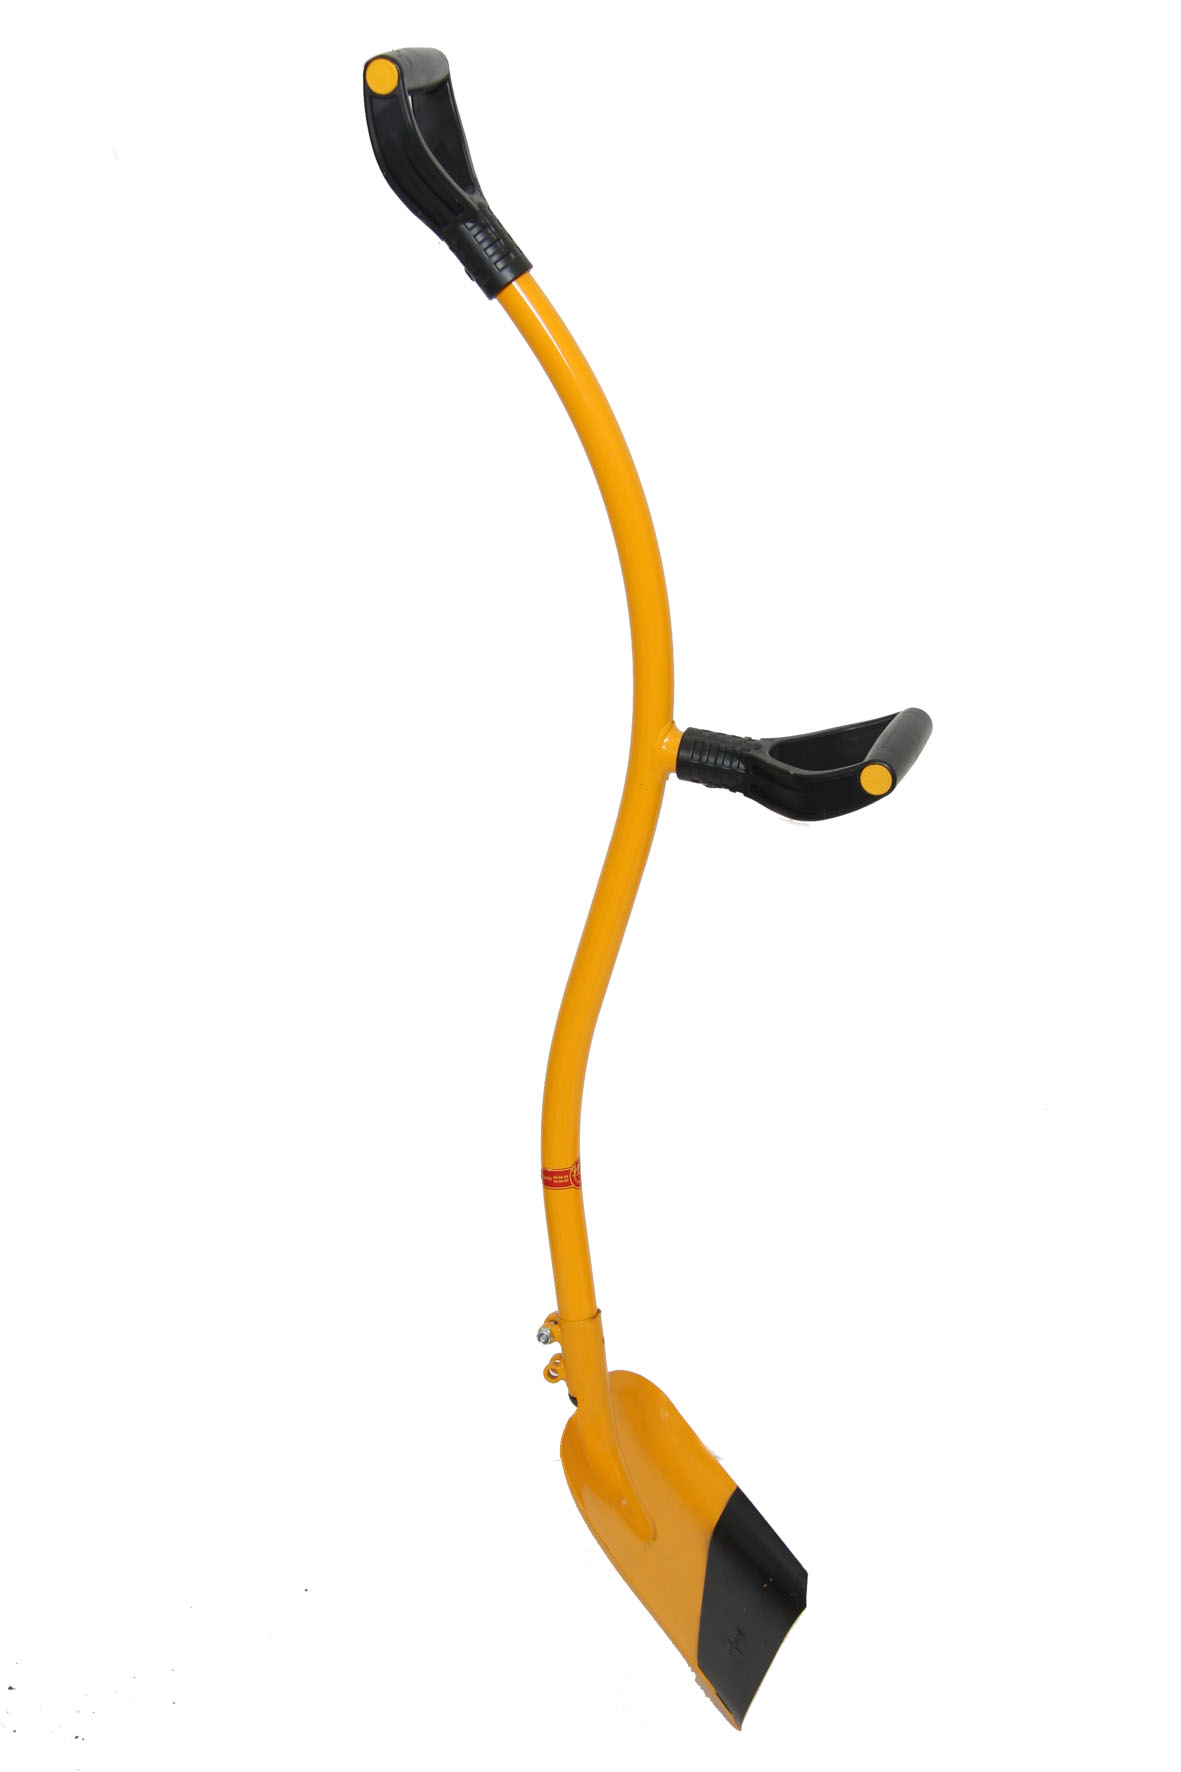 ergonomic-snow-shovel-Tornado-metal1